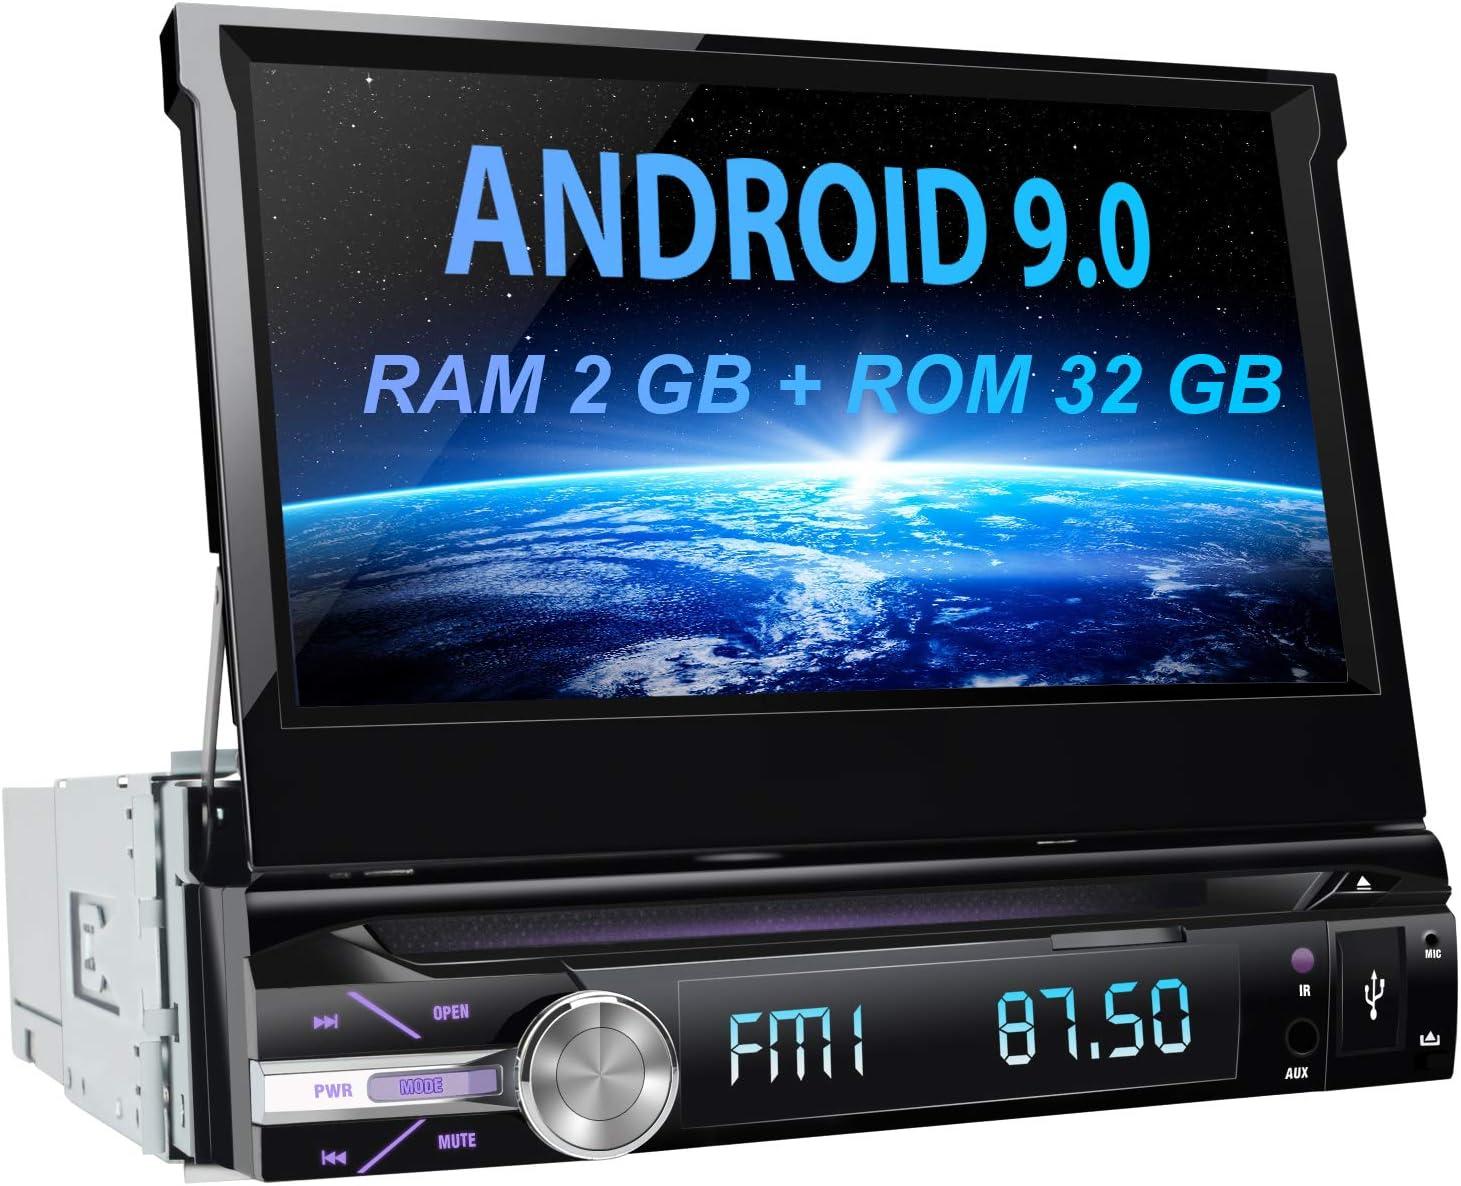 AWESAFE Android 9.0 [2GB+32GB] 7 Pulgadas Pantalla Universal 1 DIN Radio, Autoradio 1 DIN con CD DVD/WiFi/Navegador GPS/Bluetooth/Mandos Volantes/RDS/USB/SD/Subwoofer/Mirror Link